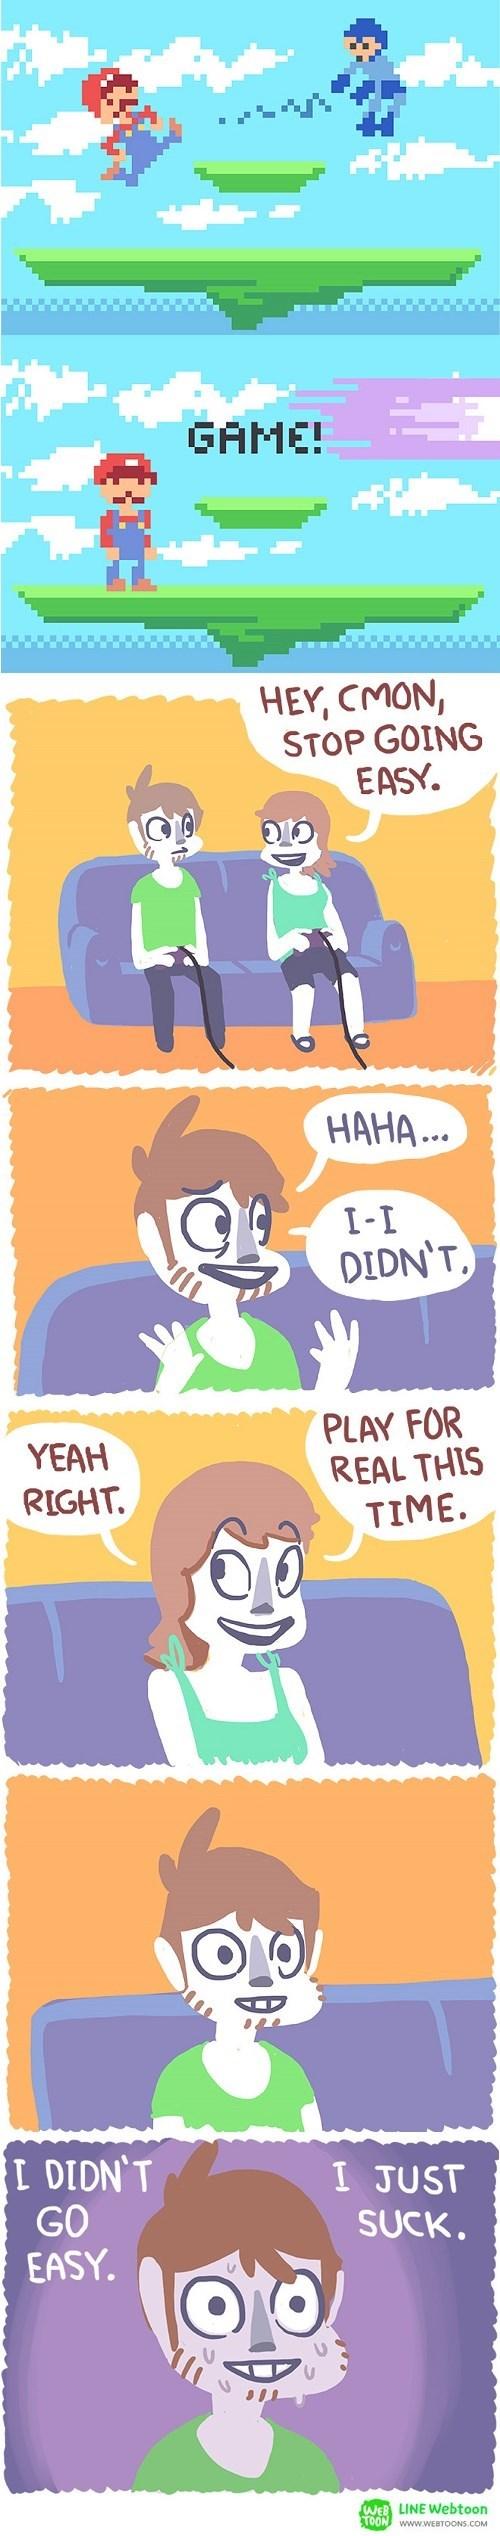 gaming shame super smash bros web comics - 8364388864